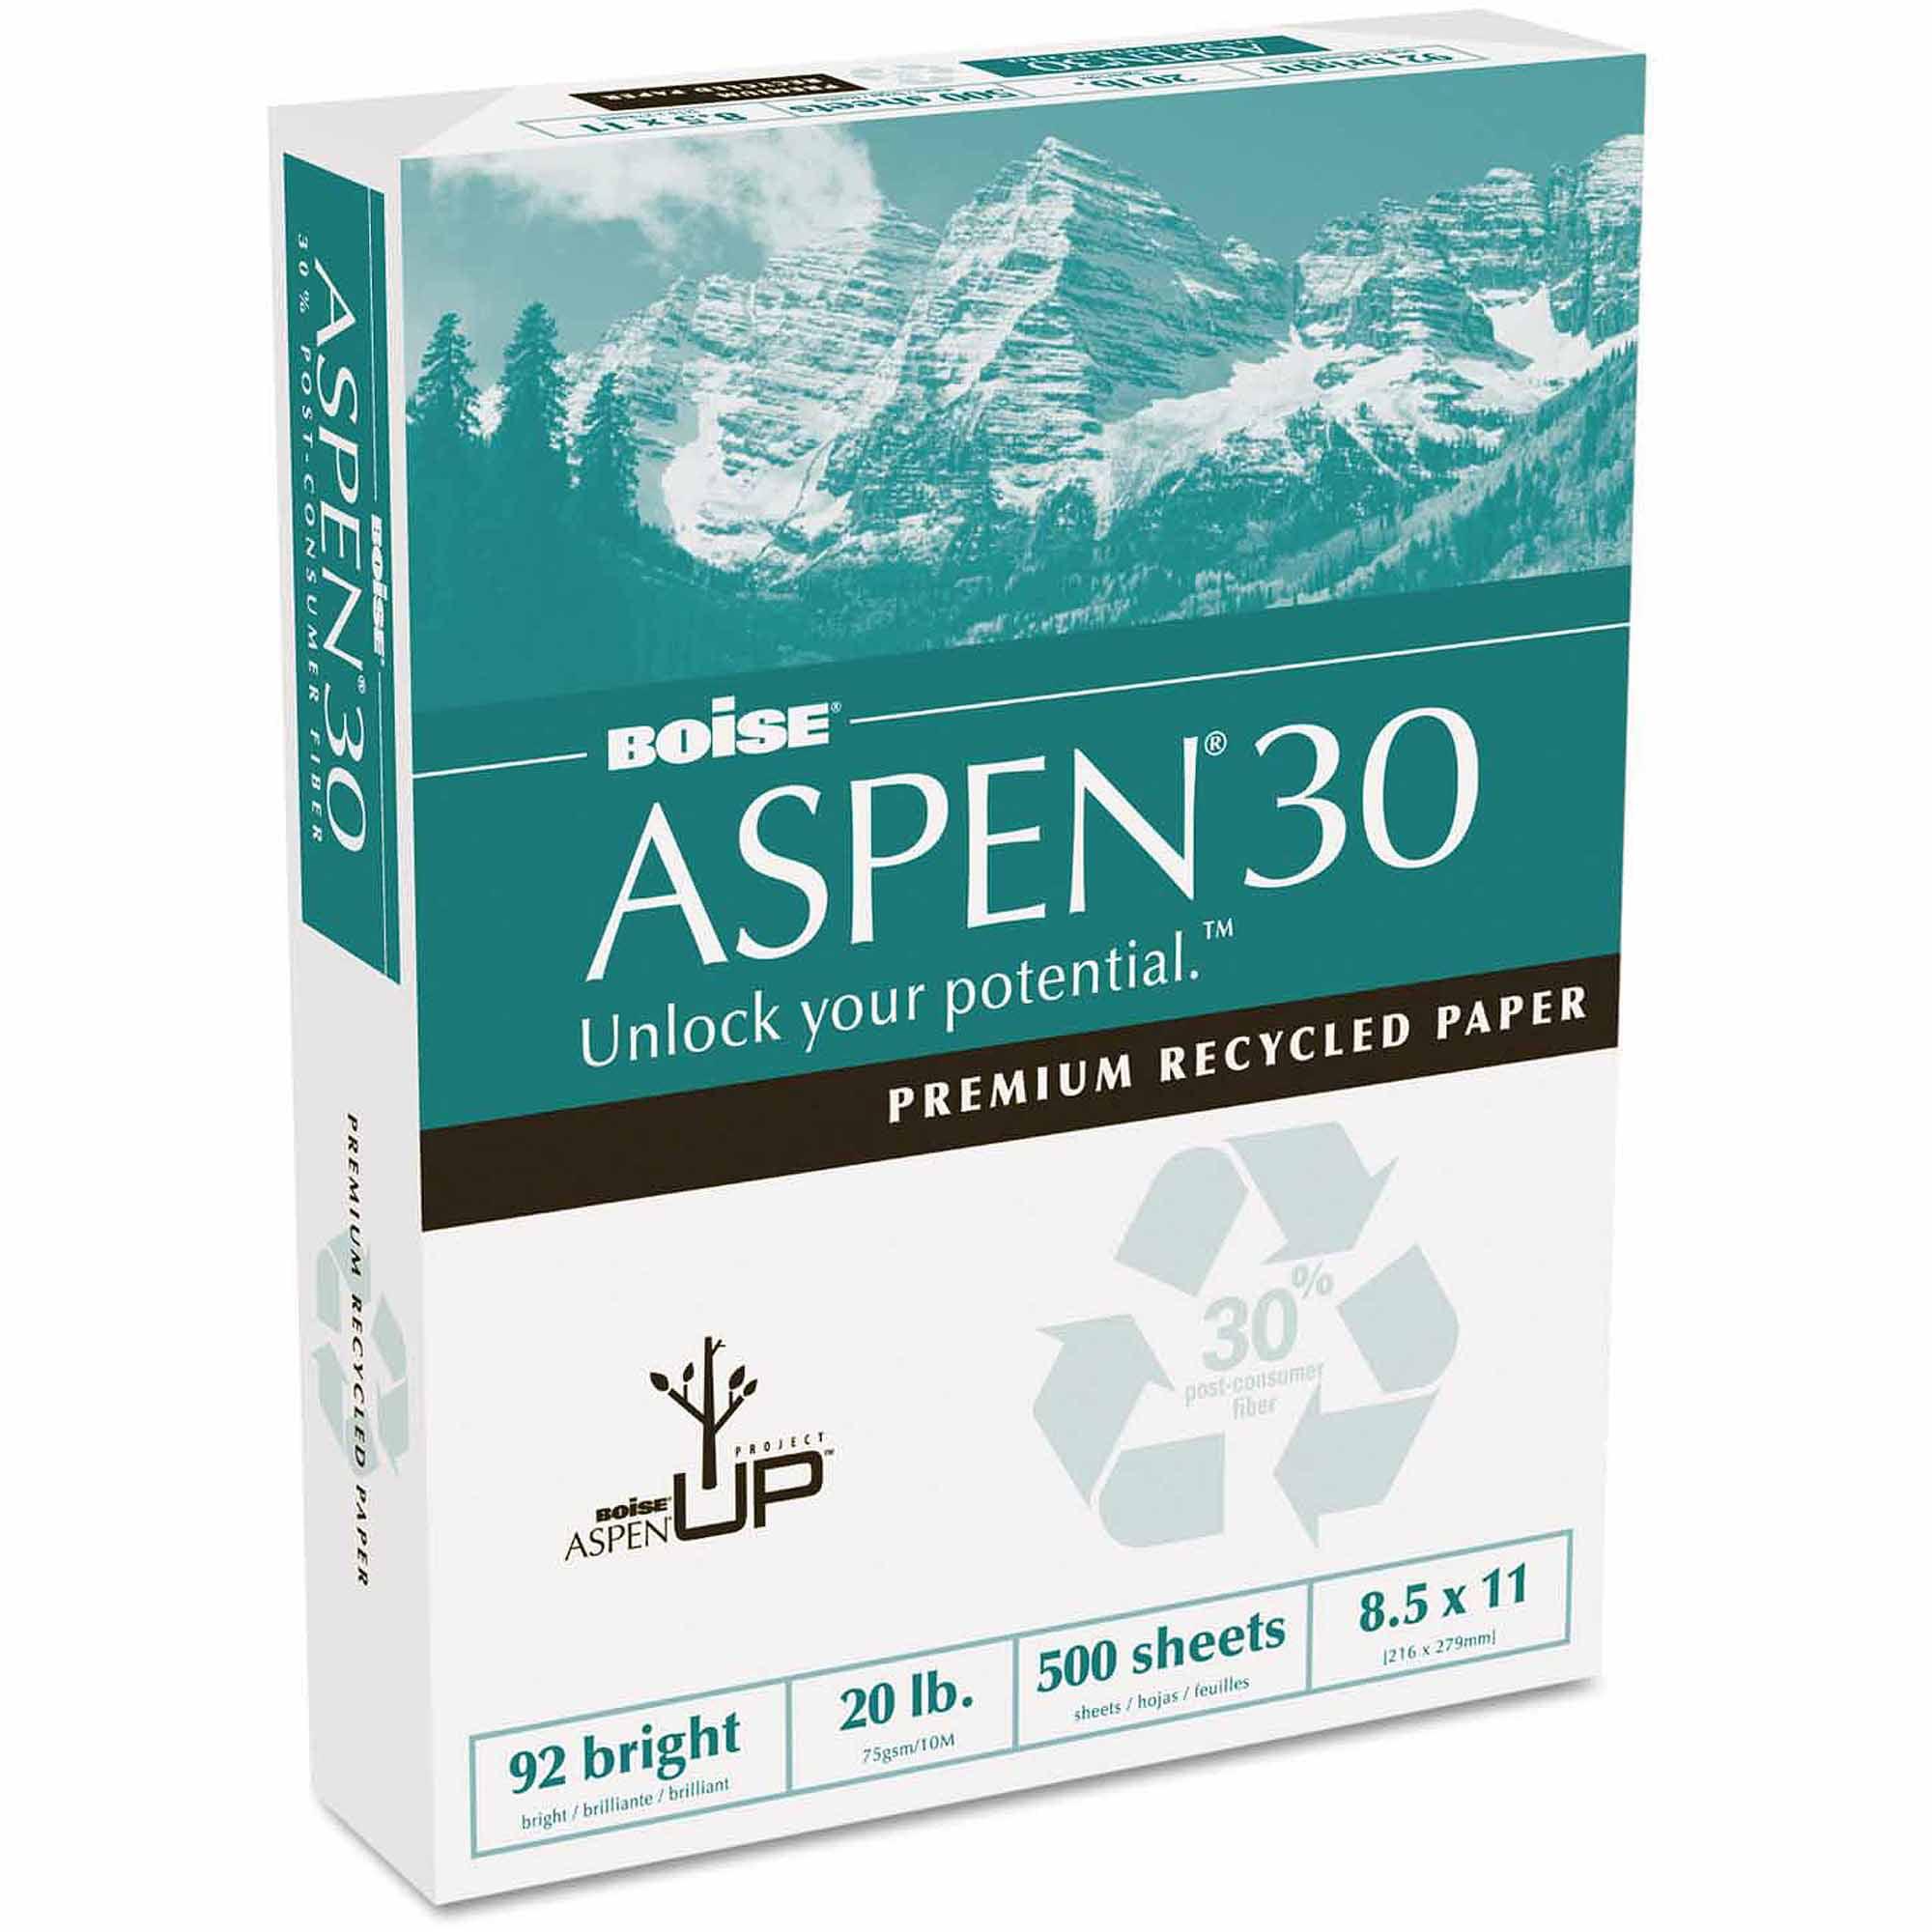 "Boise ASPEN 30% Recycled Office Paper, 92 Bright, 20 lb, 8-1/2"" x 11"", White, 5000/Carton"